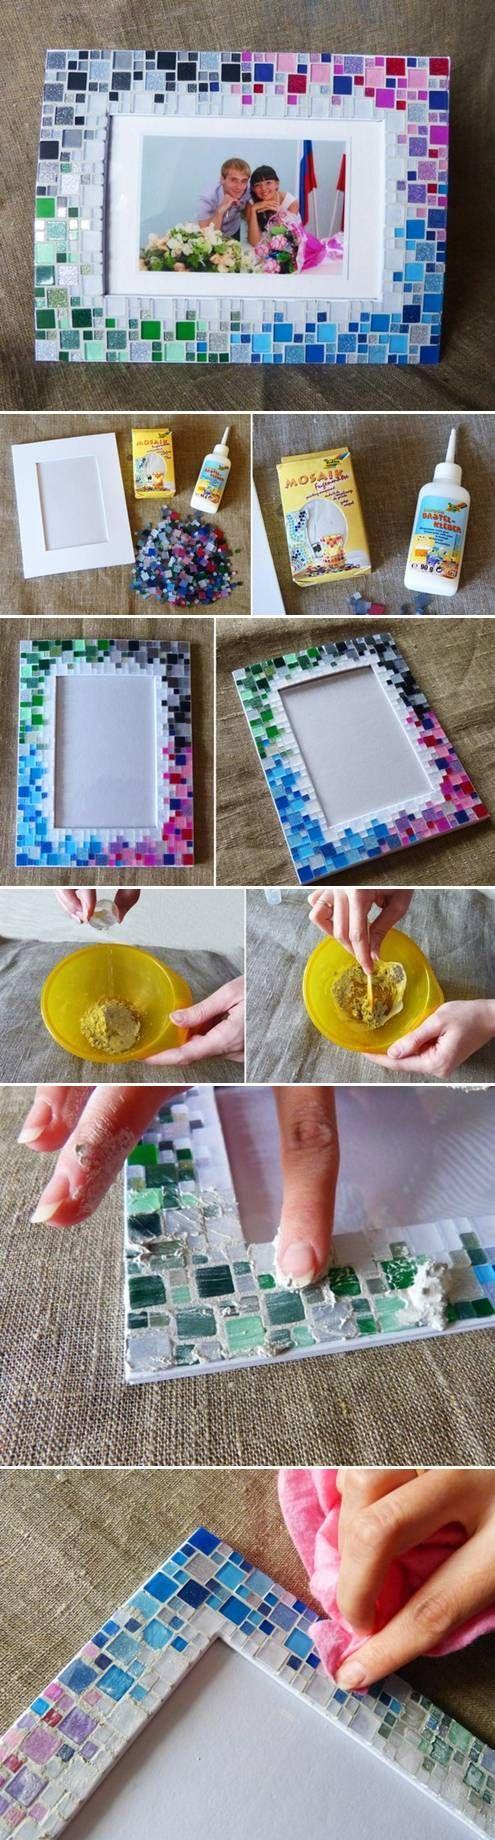 40 Impressive Diy Mosaic Projects Maker Mosaic Diy Diy Crafts